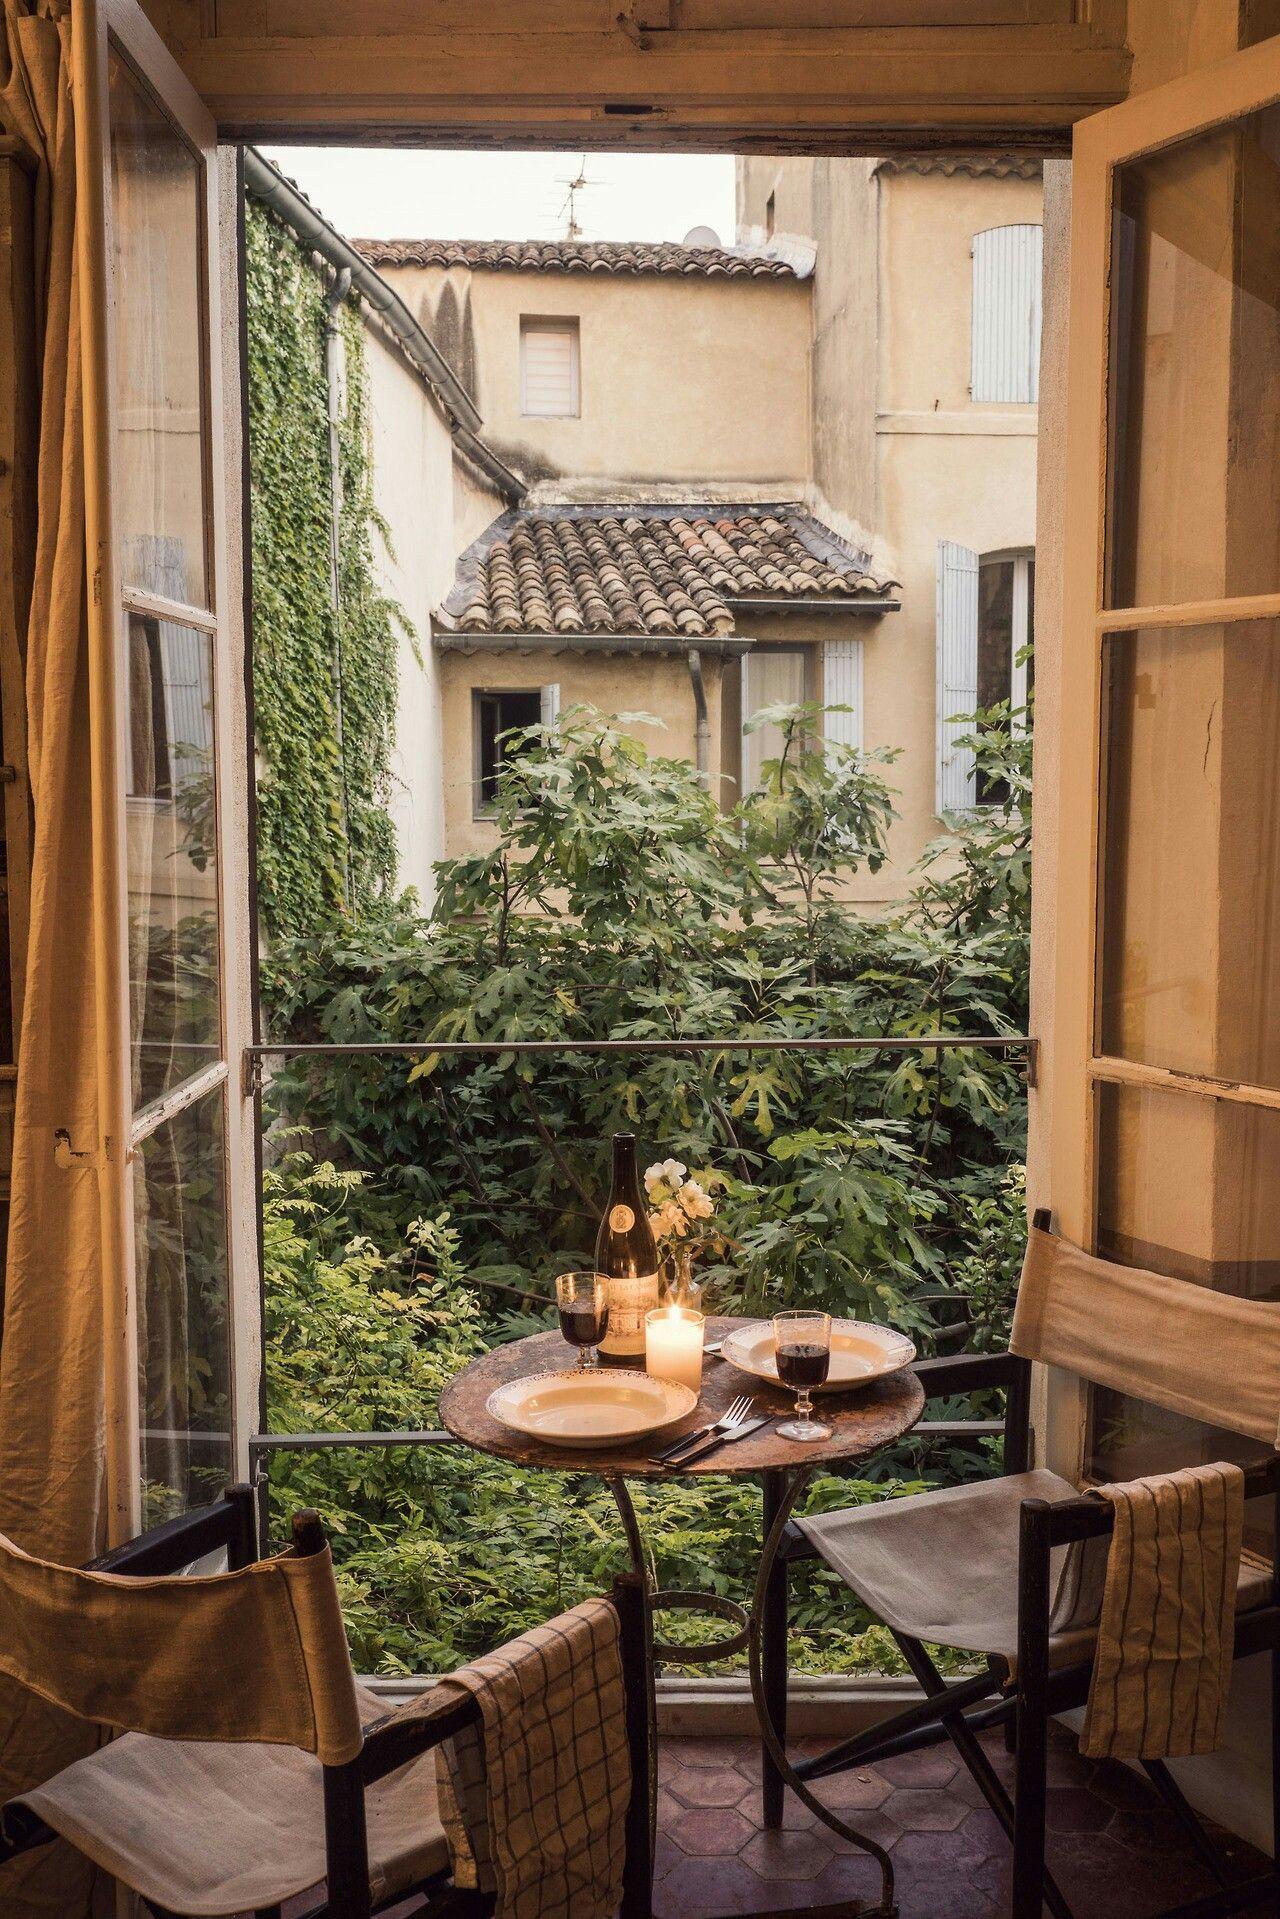 Pin di Margherita su Home | Pinterest